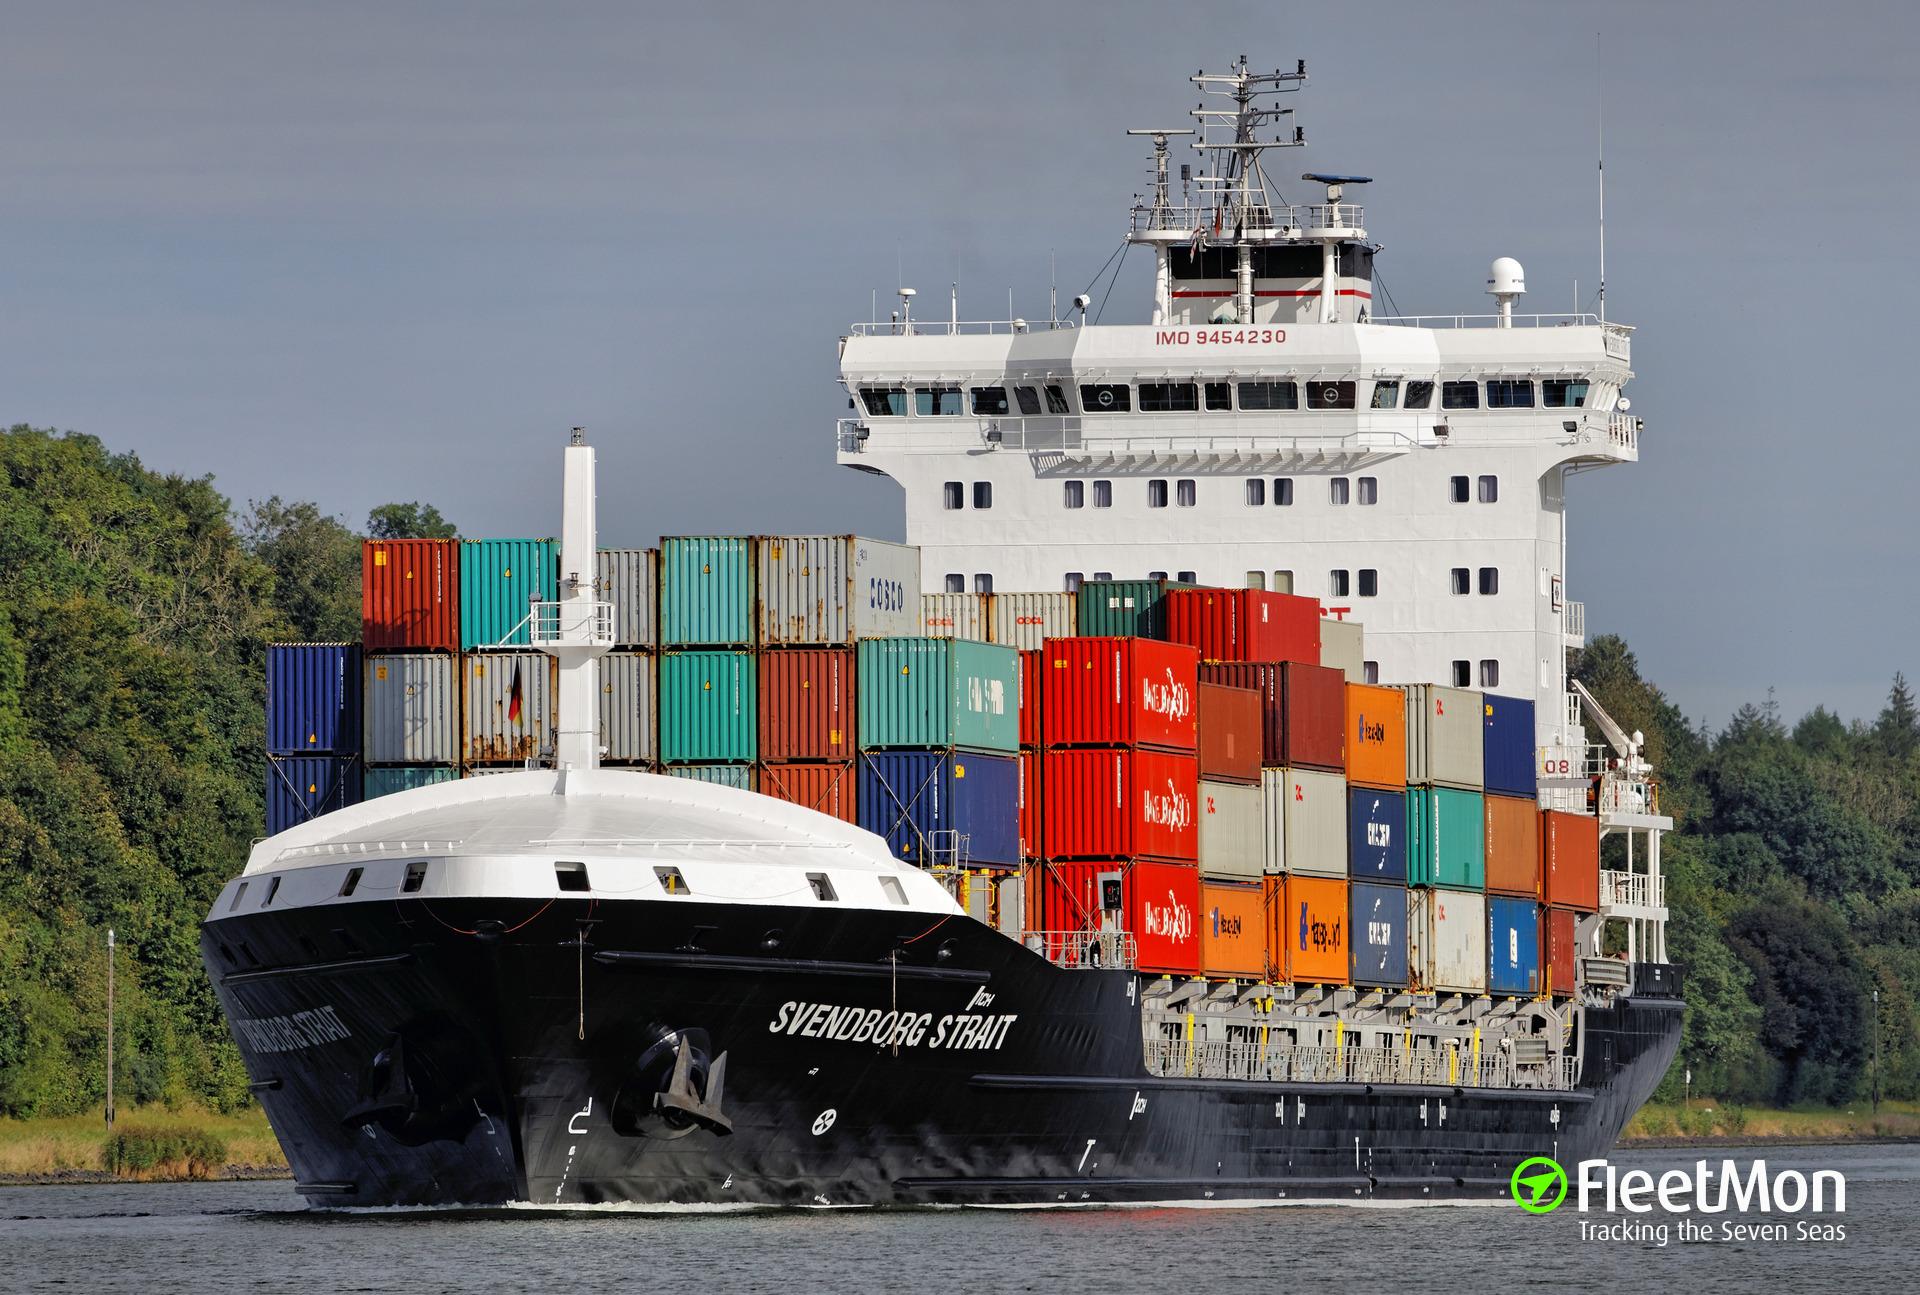 Boxship Svendborg Strait towed to Cherbourg